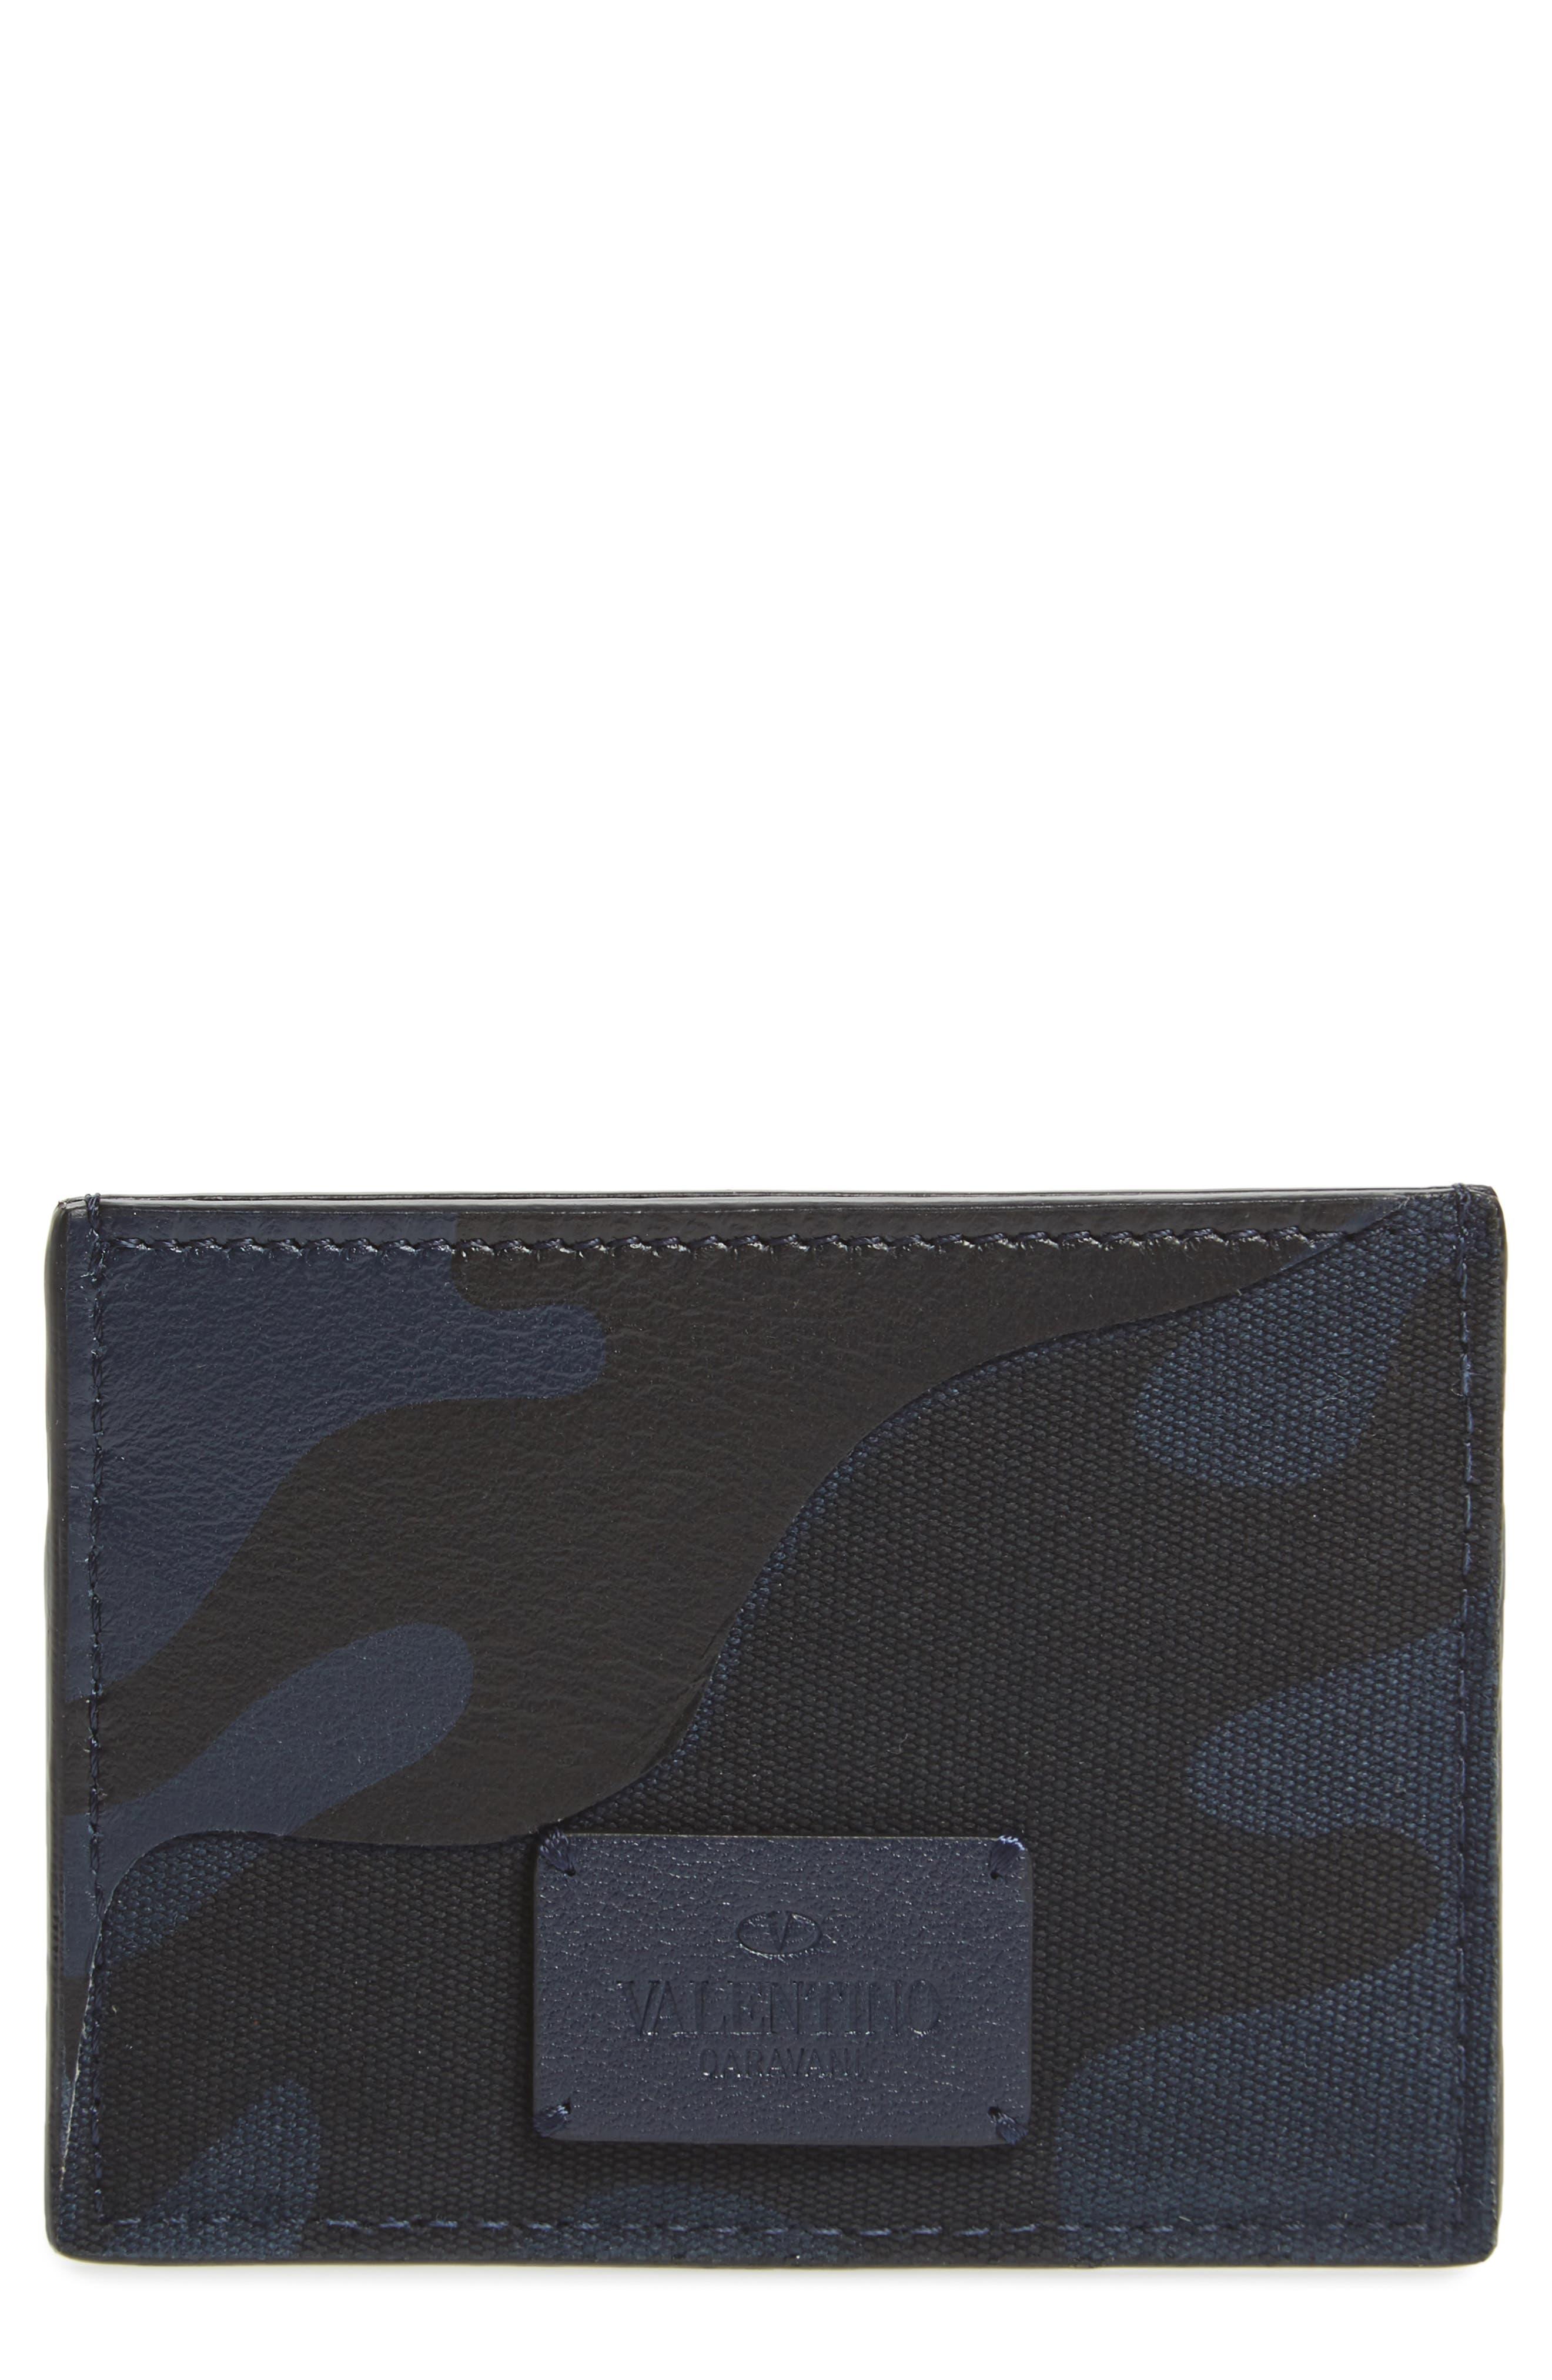 GARAVANI Camo Nylon & Leather Card Case,                         Main,                         color, Marine